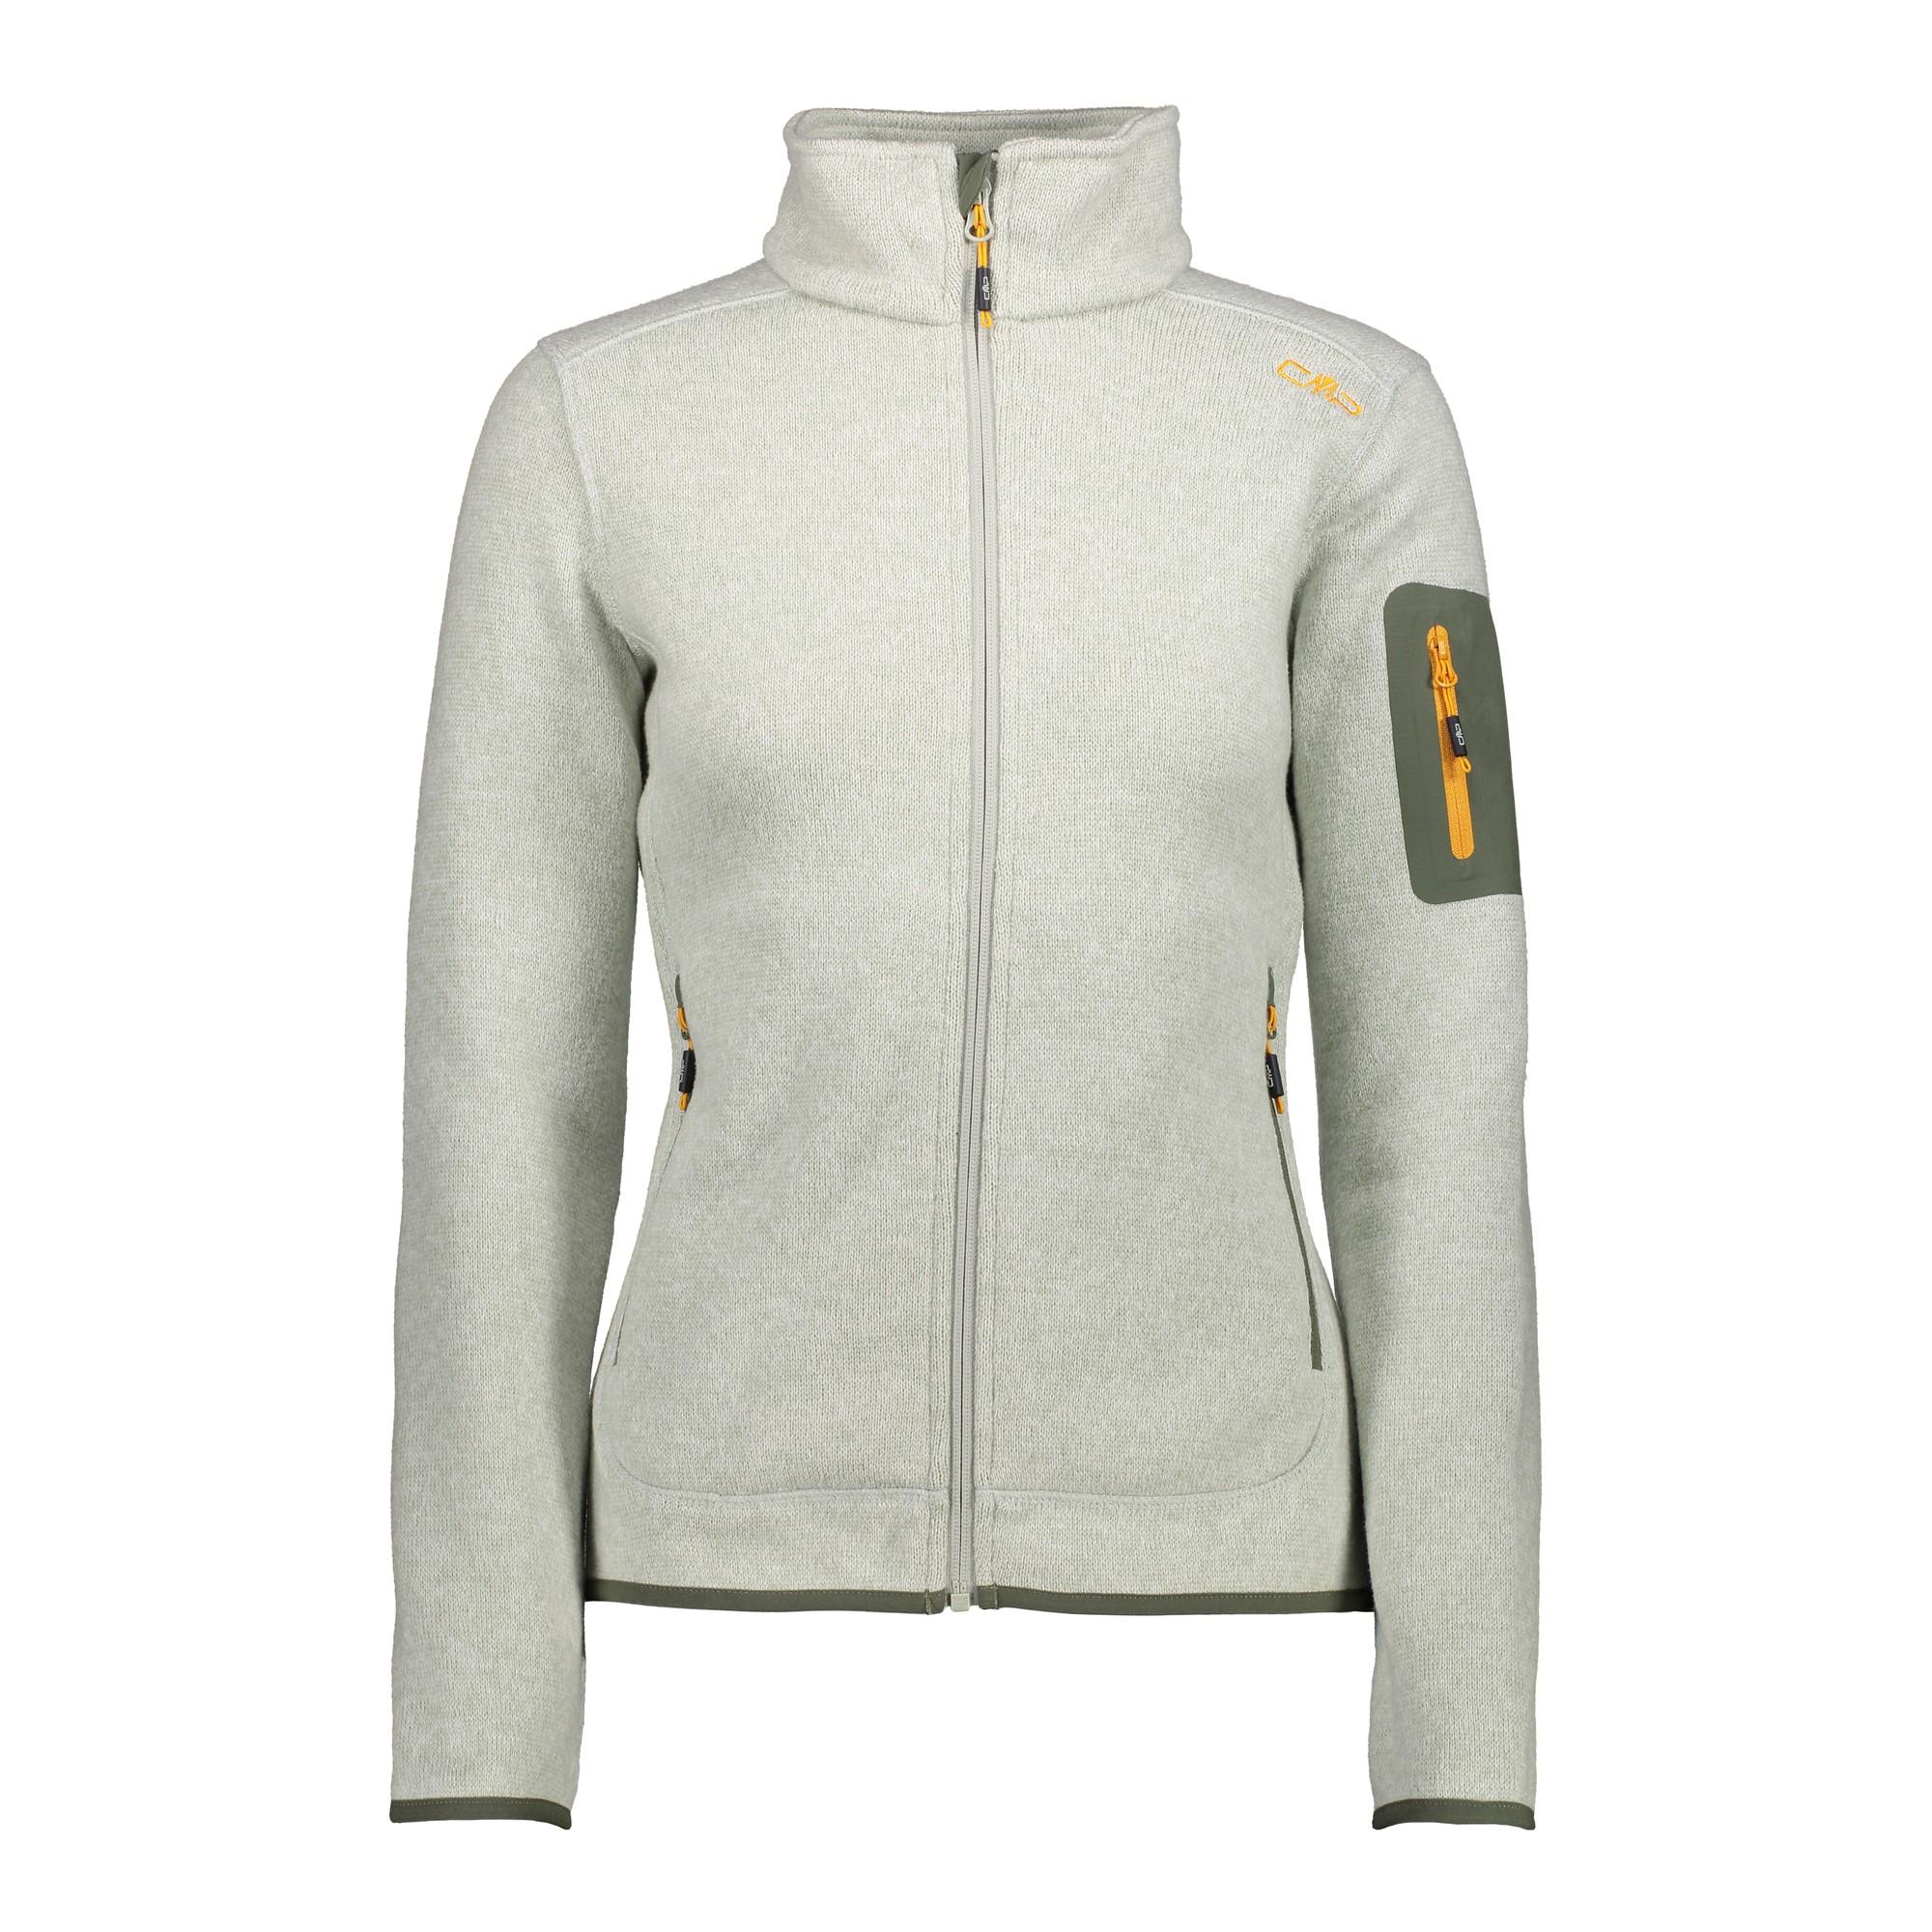 Woman Jacket Cmp Knitted Damen 3h14746 Fleece Fleecejacke Melange xnvxatwqzS